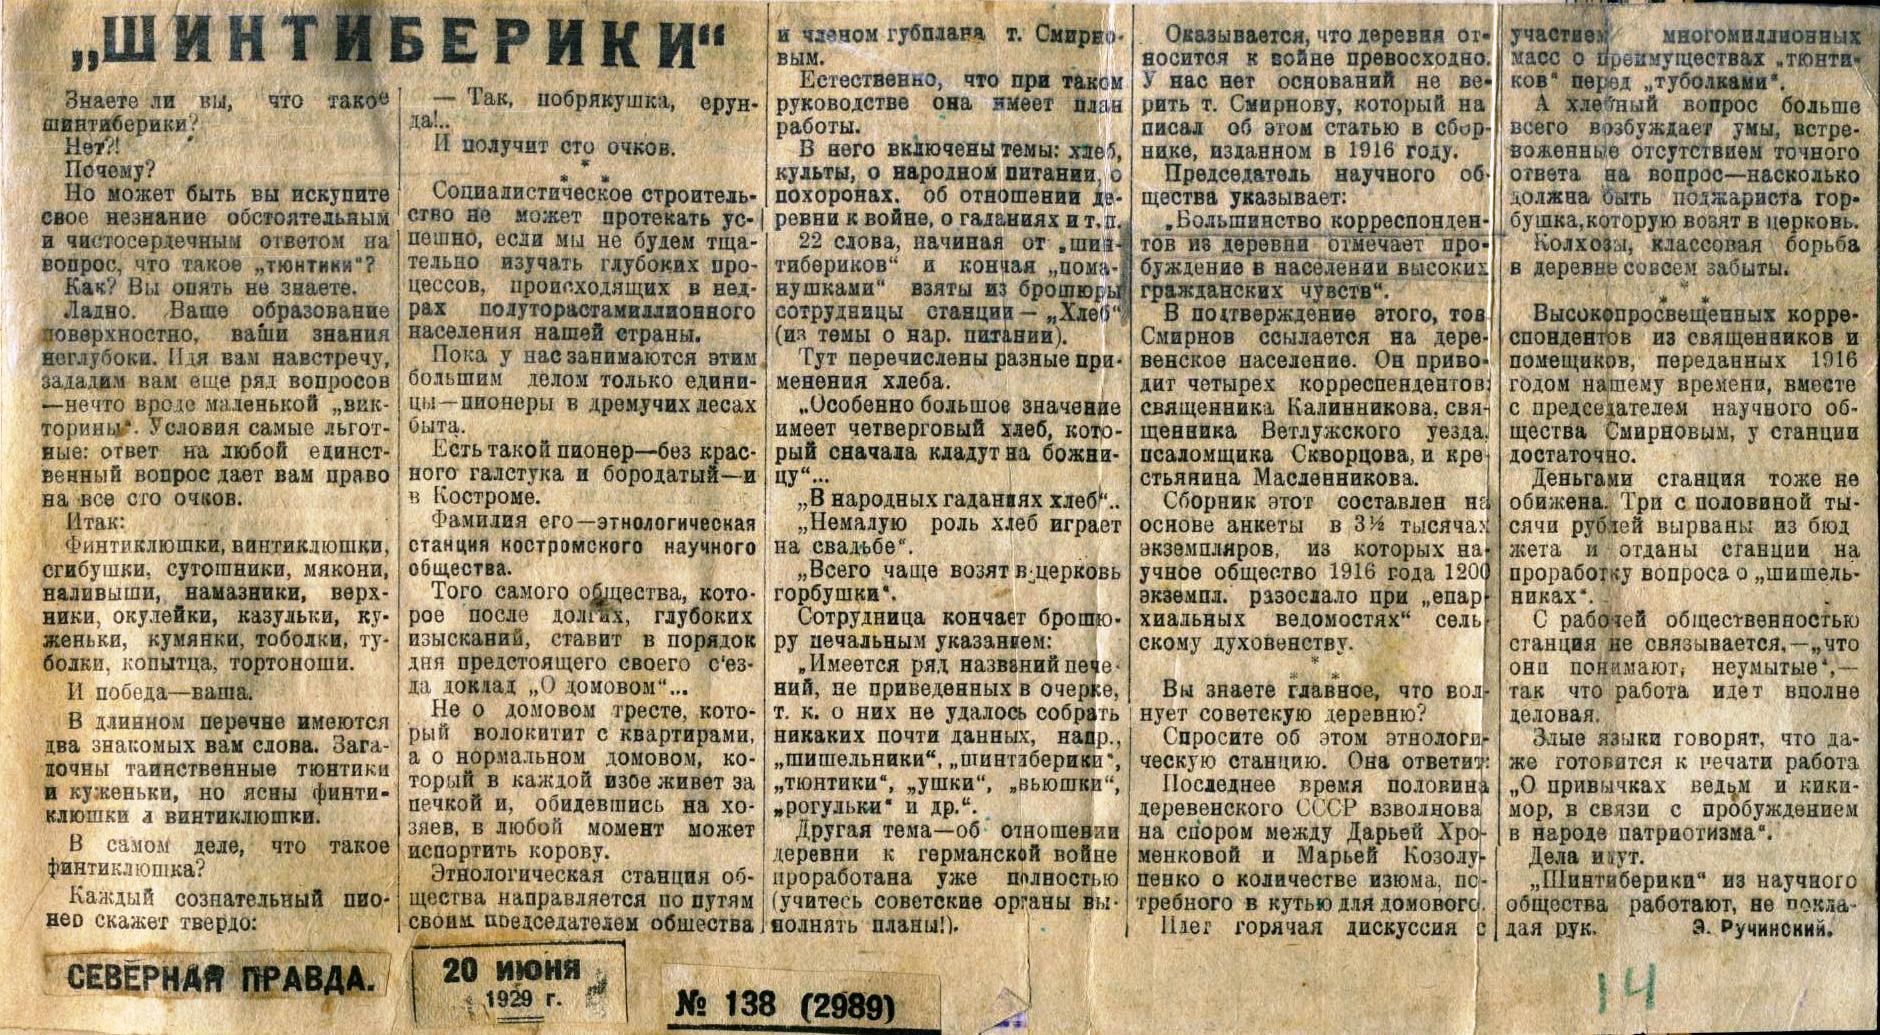 <a href='http://kosarchive.ru/expo45'>Северная правда. – 1929. – 20 июня. – С. 6.</a>